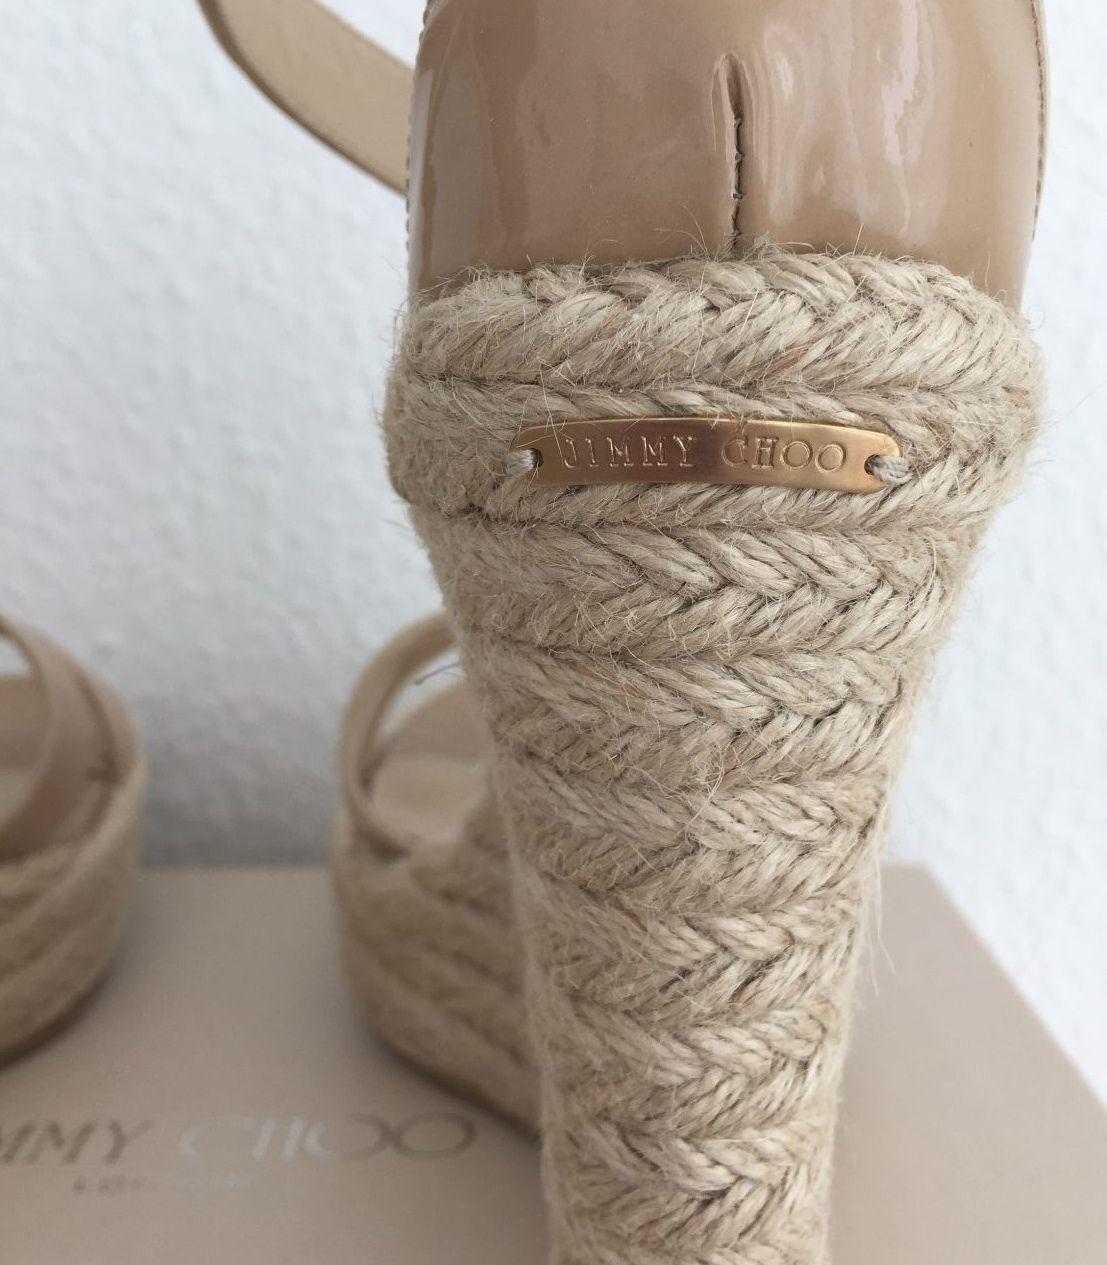 Jimmy Jimmy Jimmy Choo COMPENSES Porto Nude Velours 39,5 or Chaussures sandales d'été blogueurs Talons ae13c5